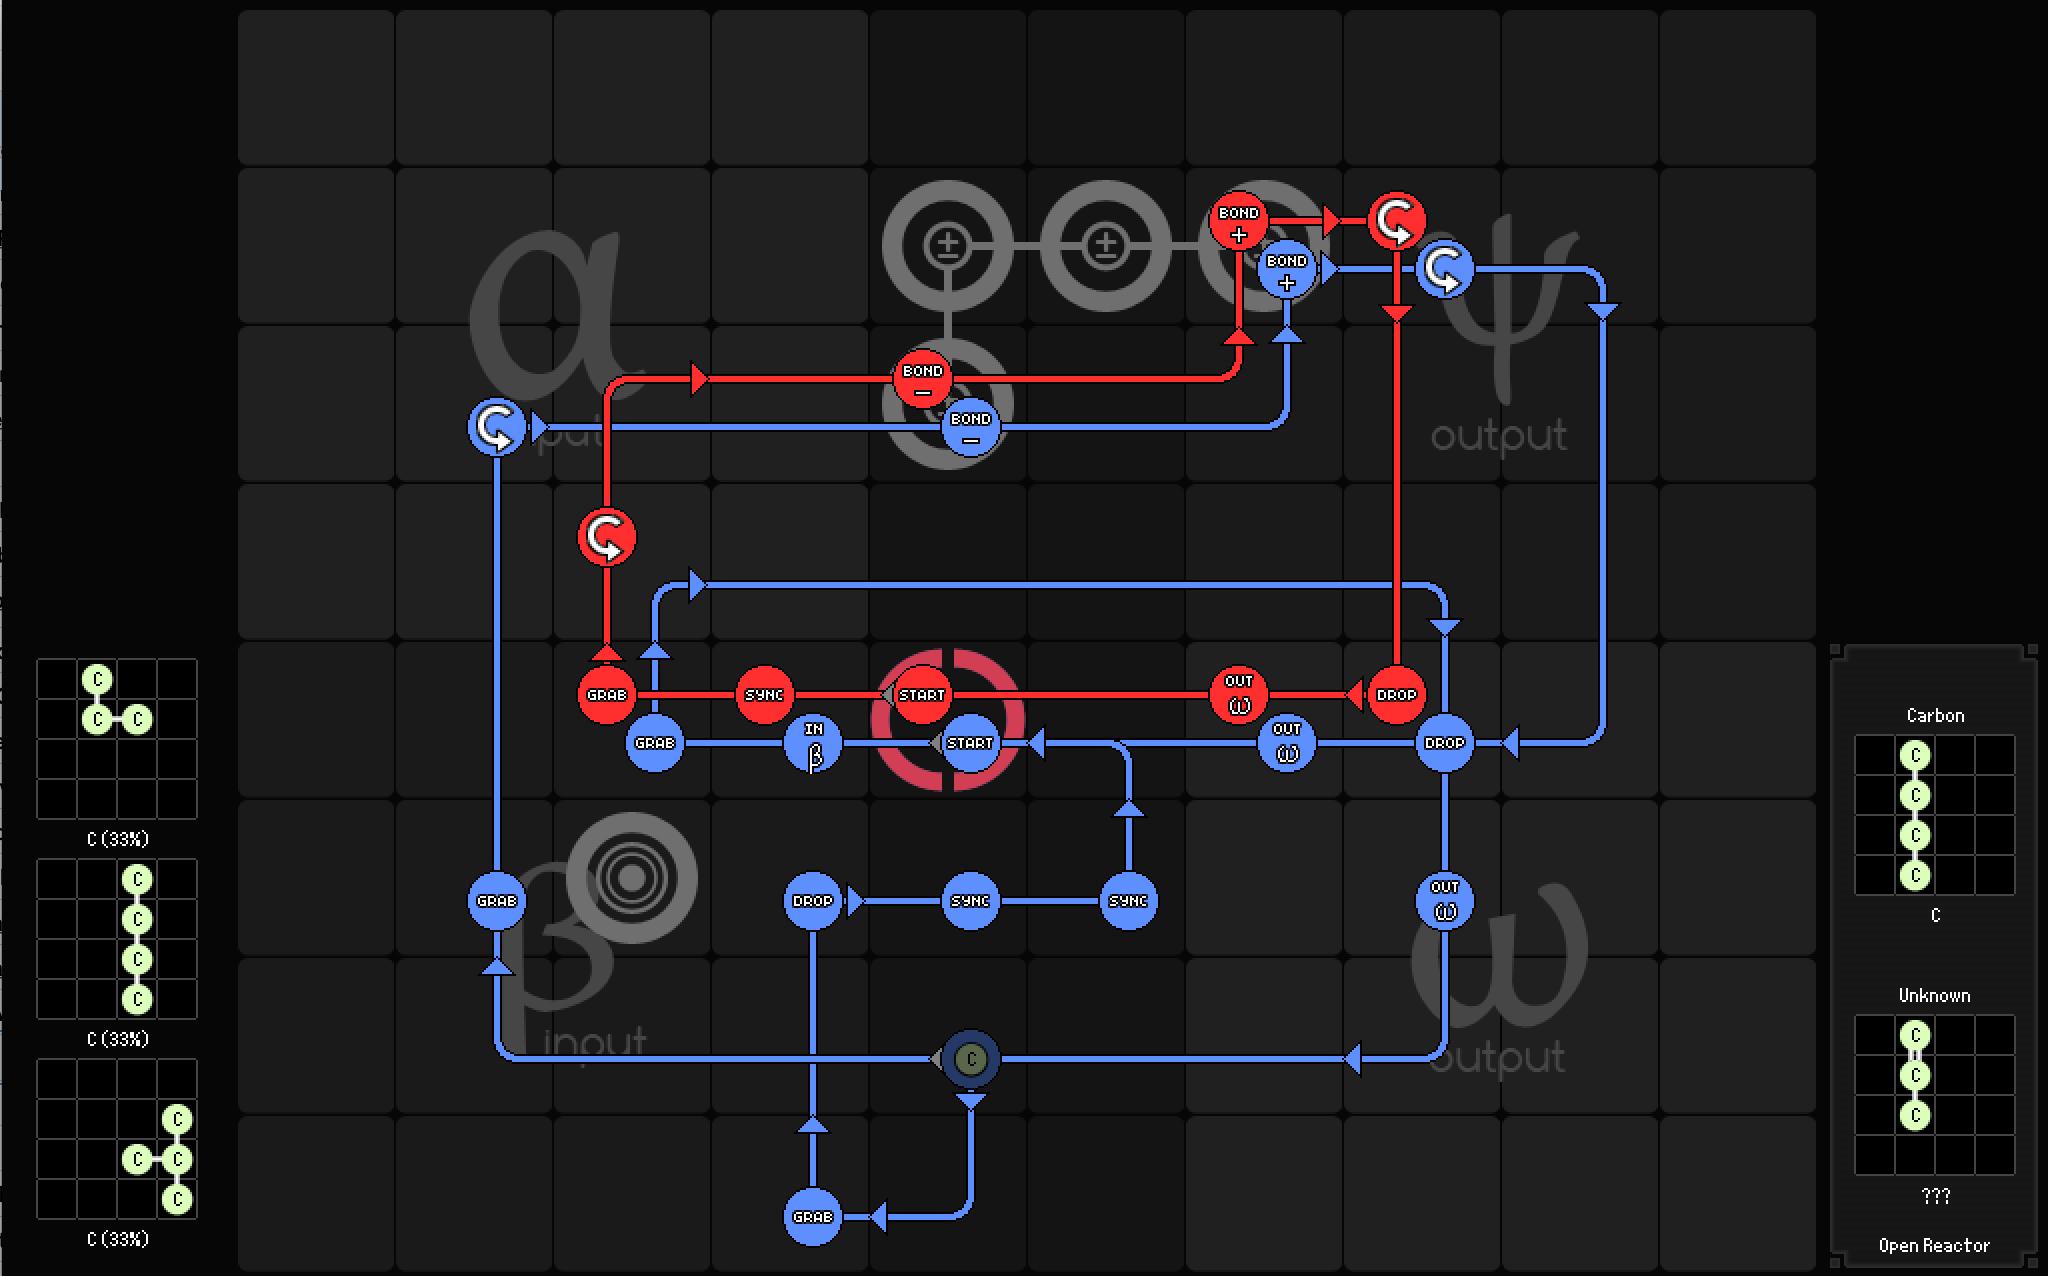 1_Story_Mode/6_Hephaestus_IV/SpaceChem-6.6.a/Reactor_1.png